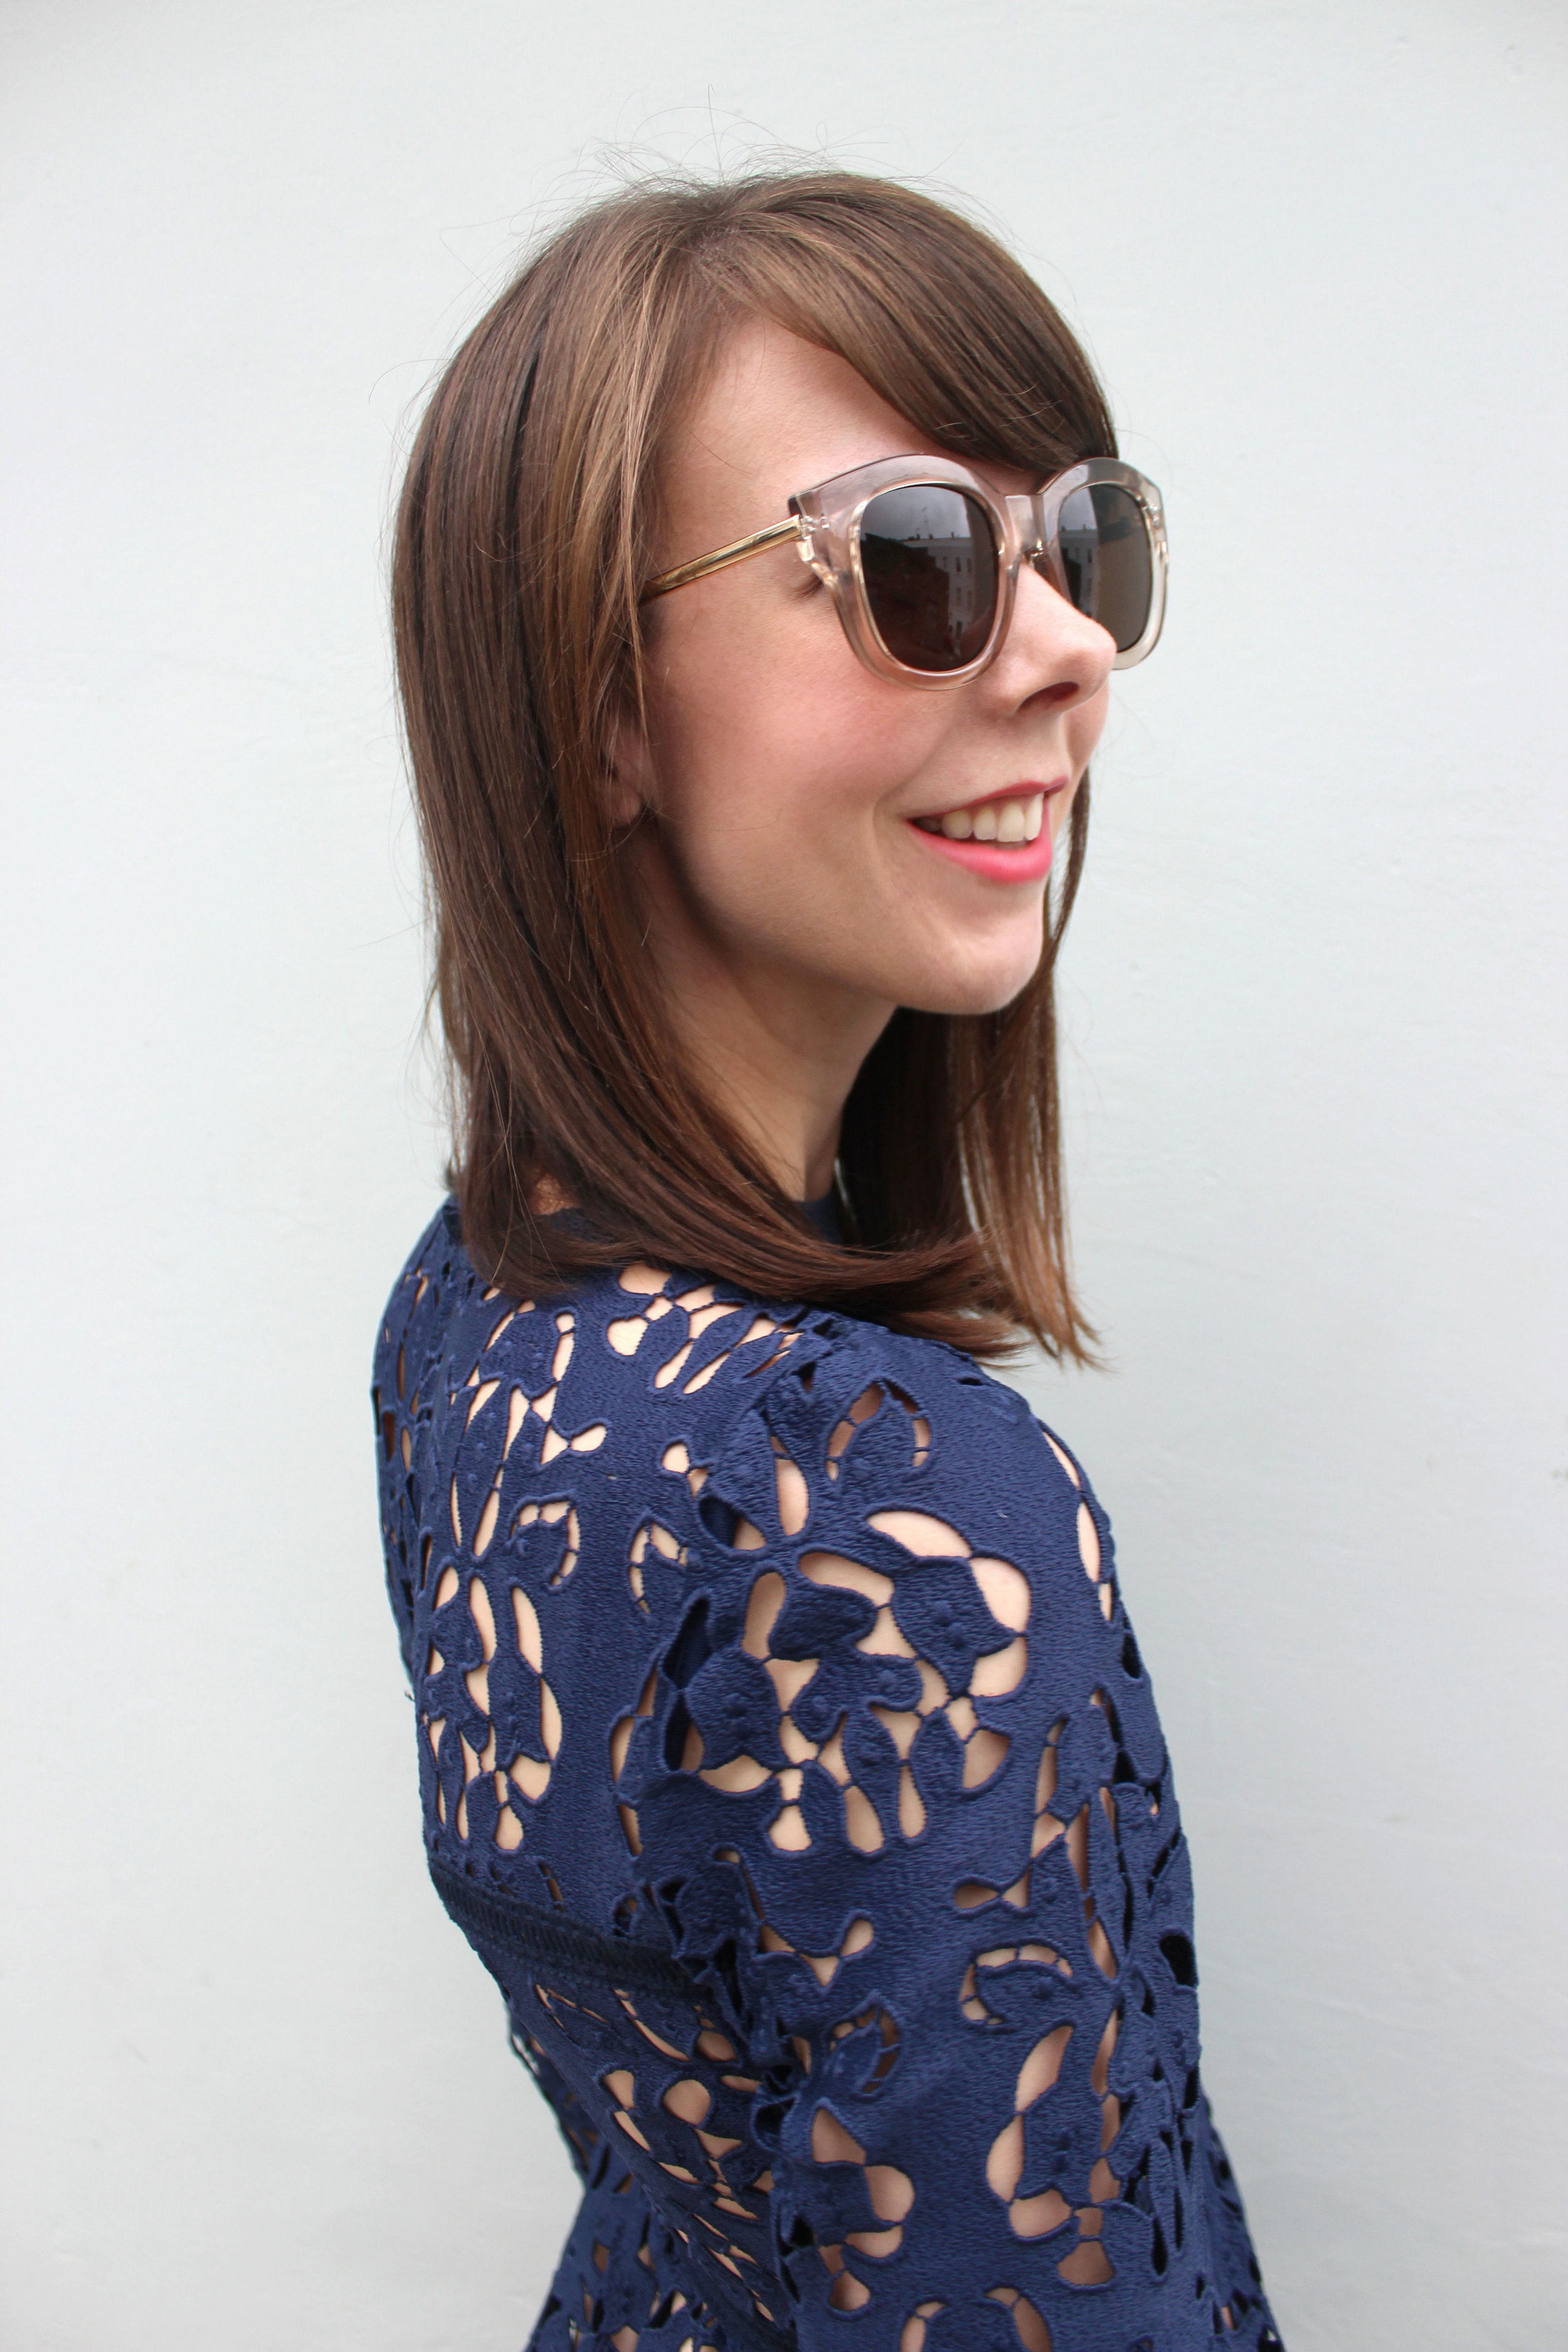 Zara lace dress, Le Specs sunglasses, Topshop lipstick